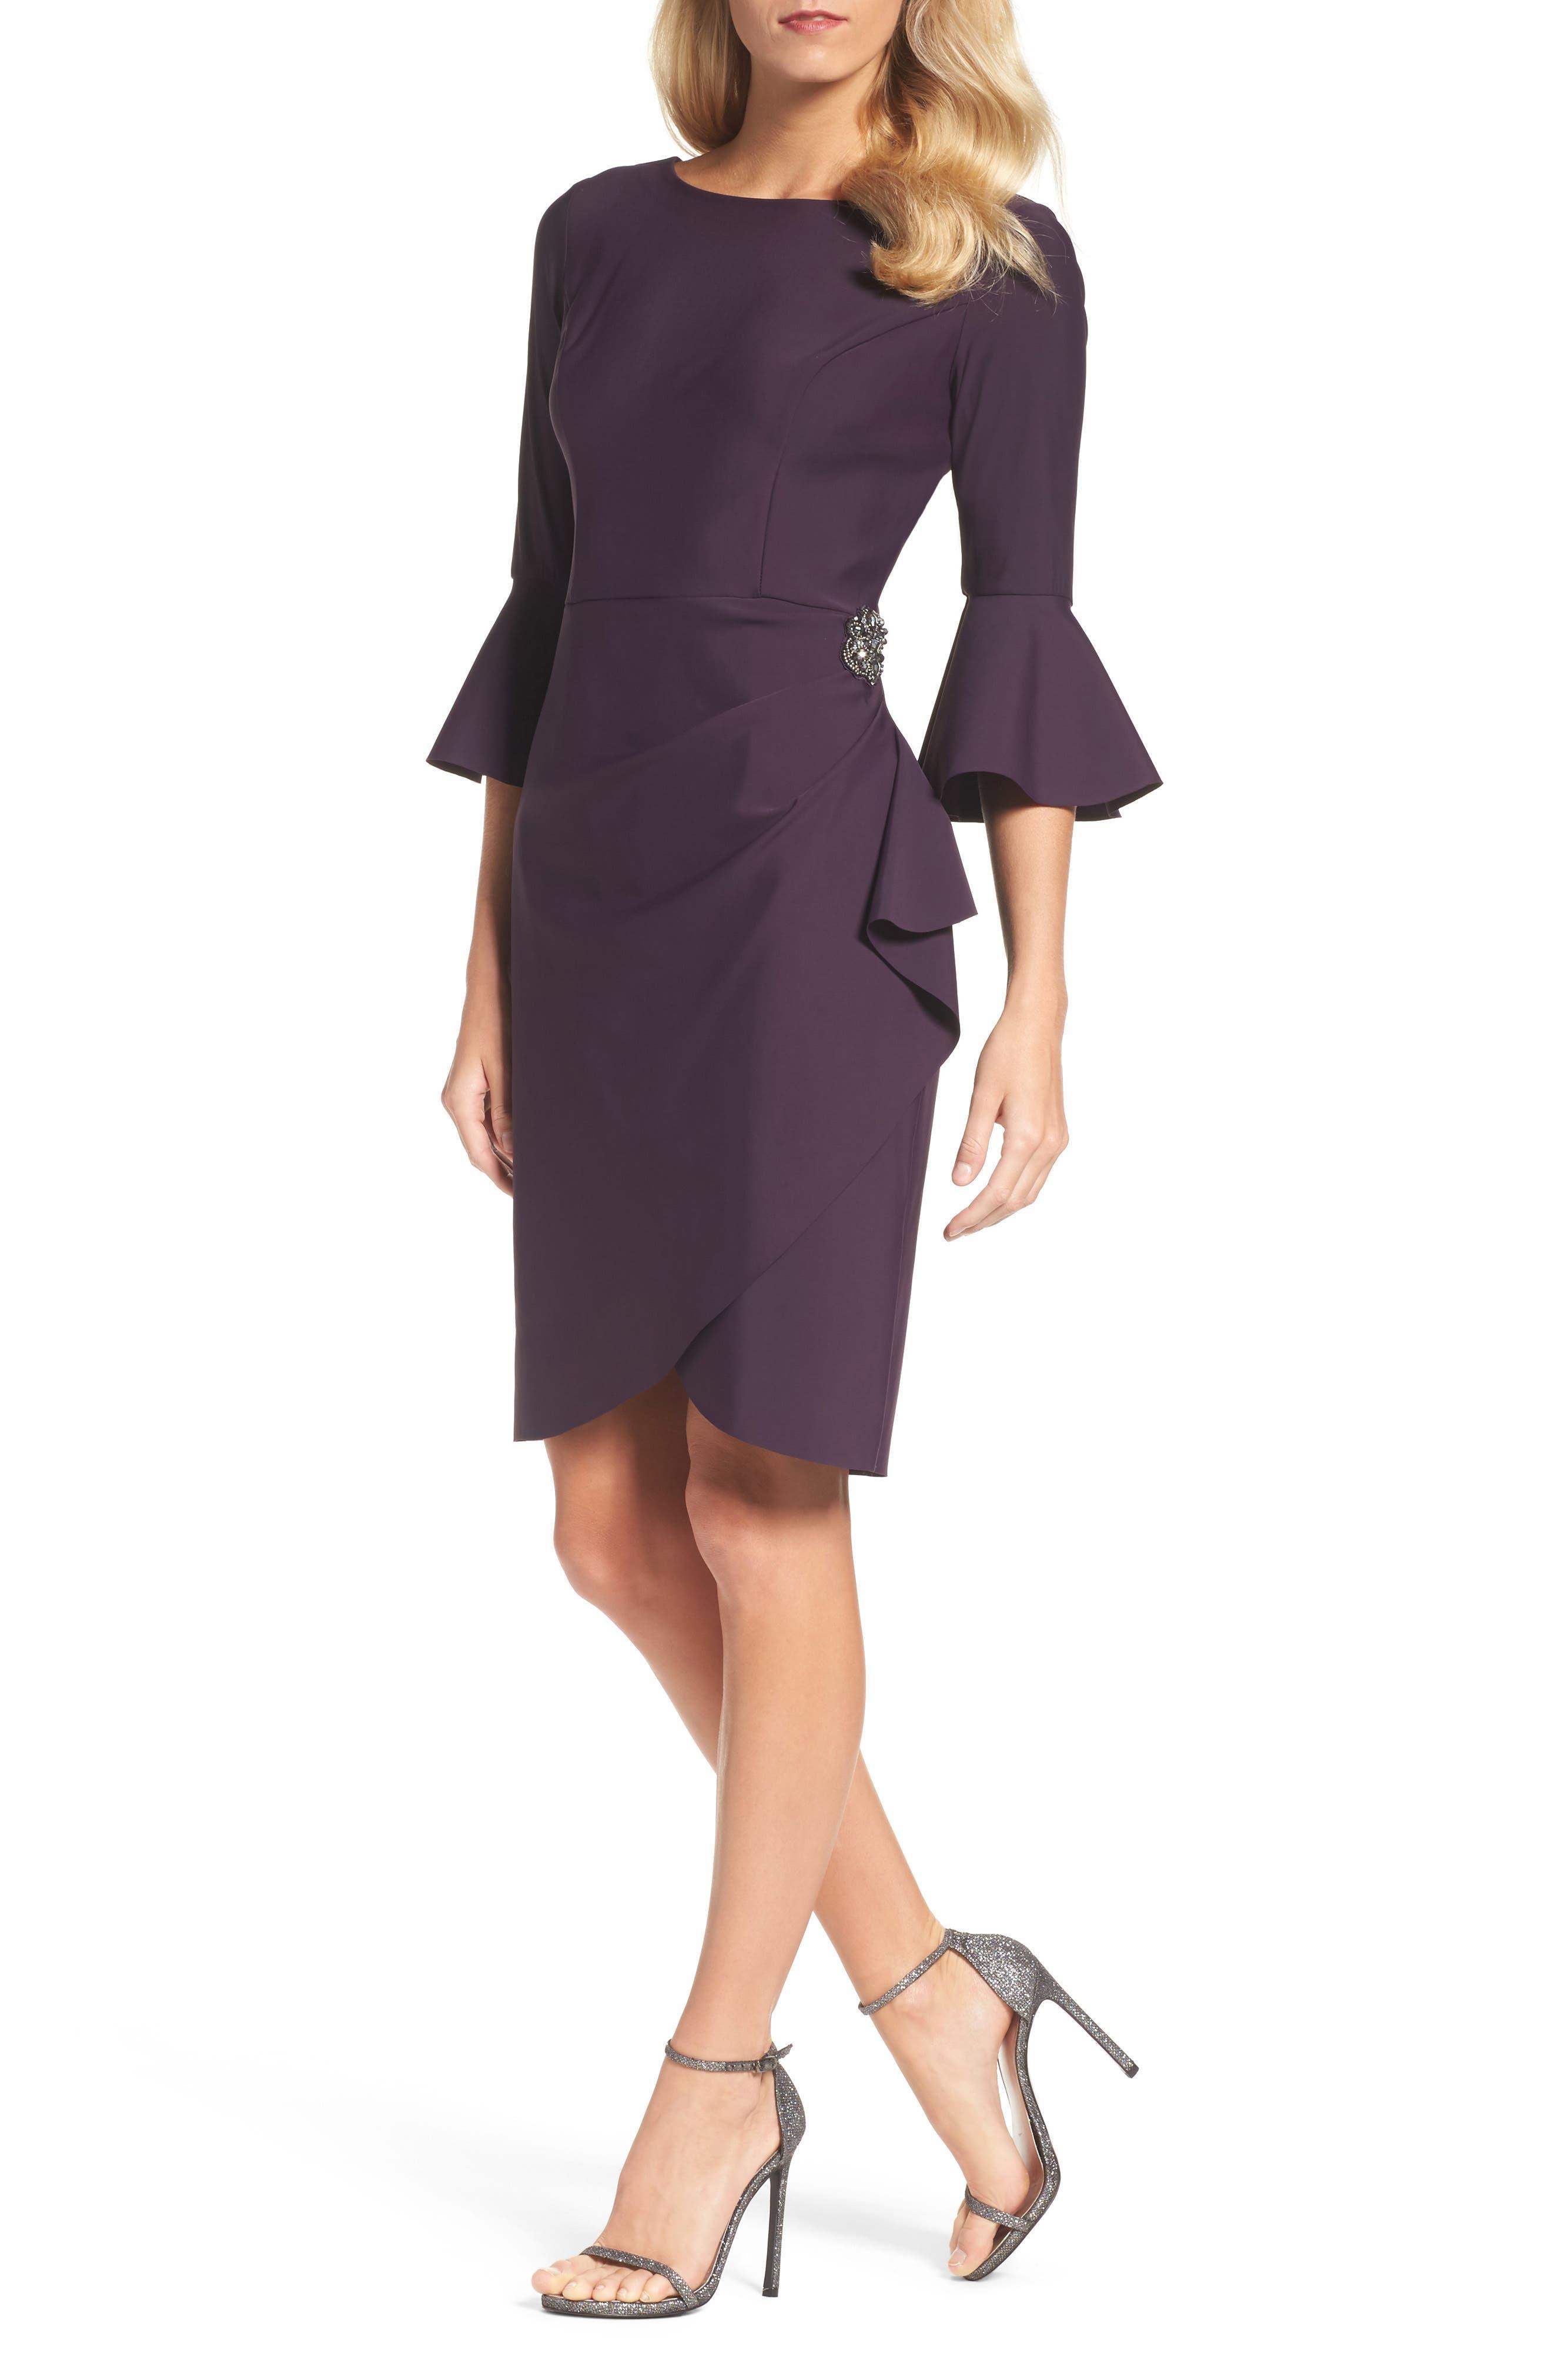 Alternate Image 1 Selected - Alex Evenings Bell Sleeve Sheath Dress (Regular & Petite)